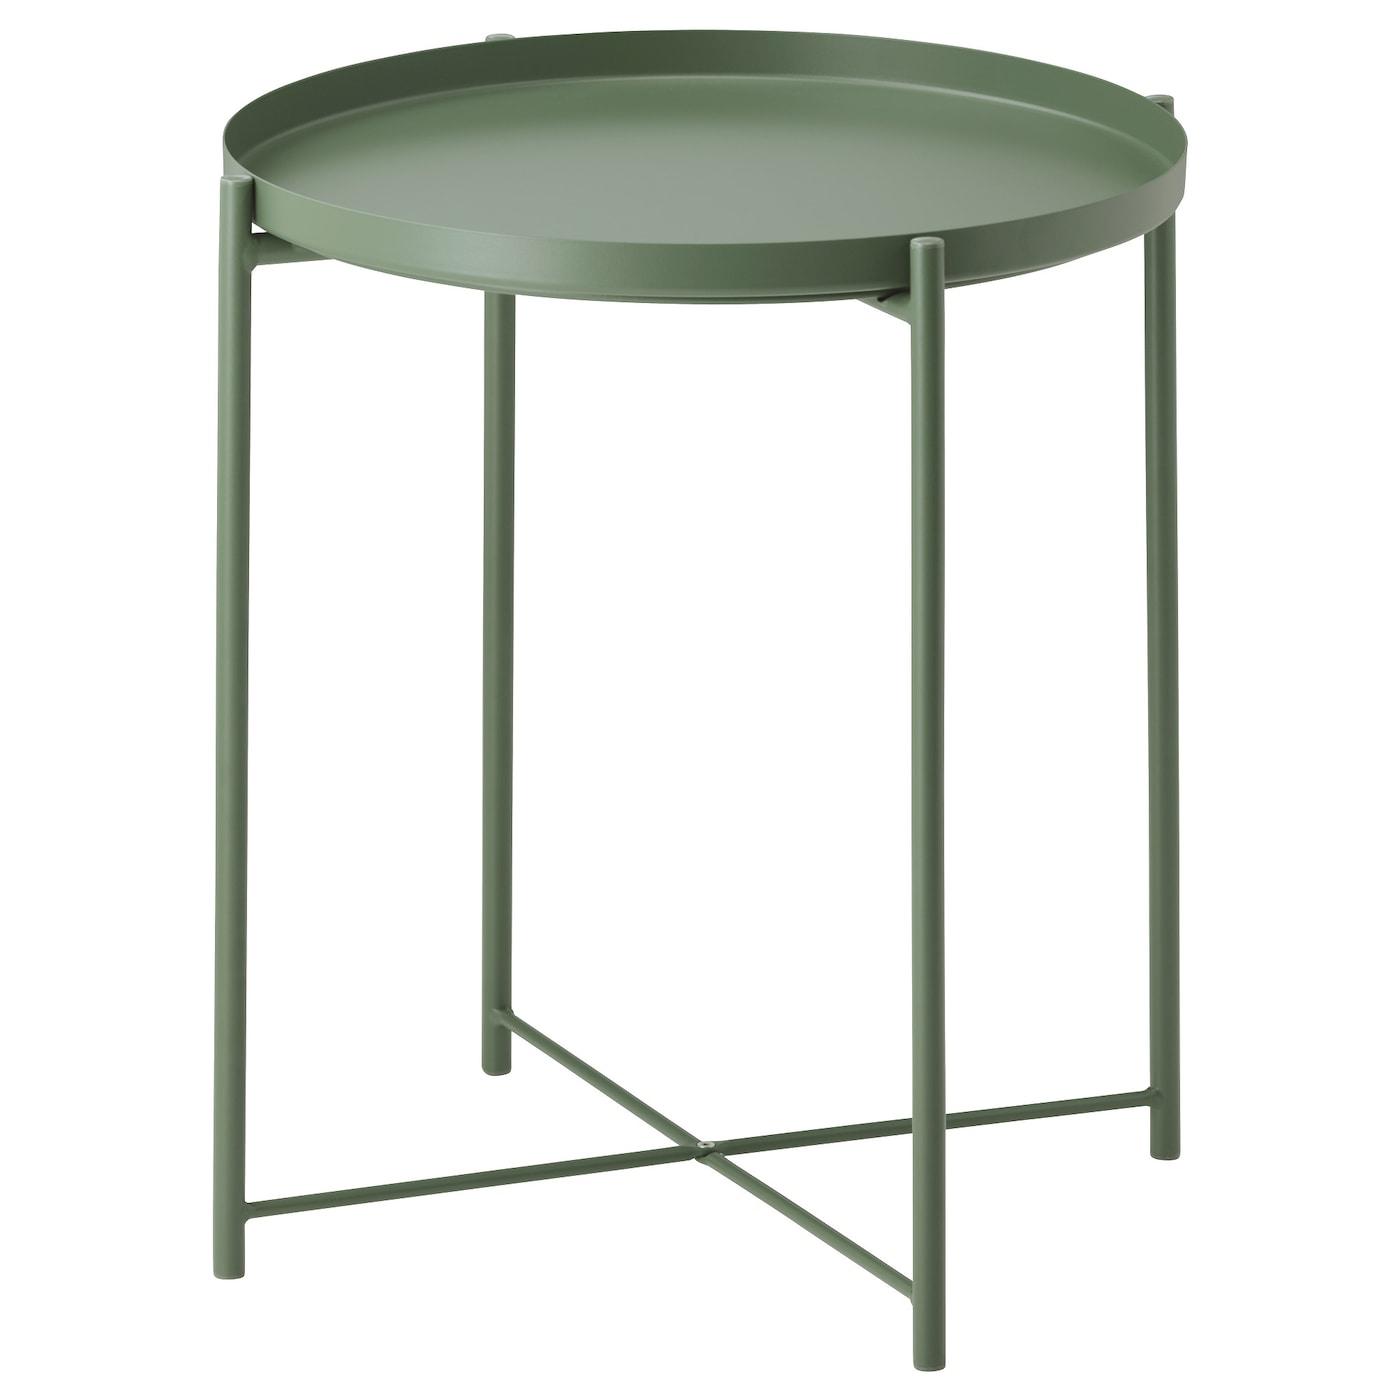 Gladom Table/plateau - Vert Foncé 45X53 Cm dedans Table Basse De Jardin Ikea